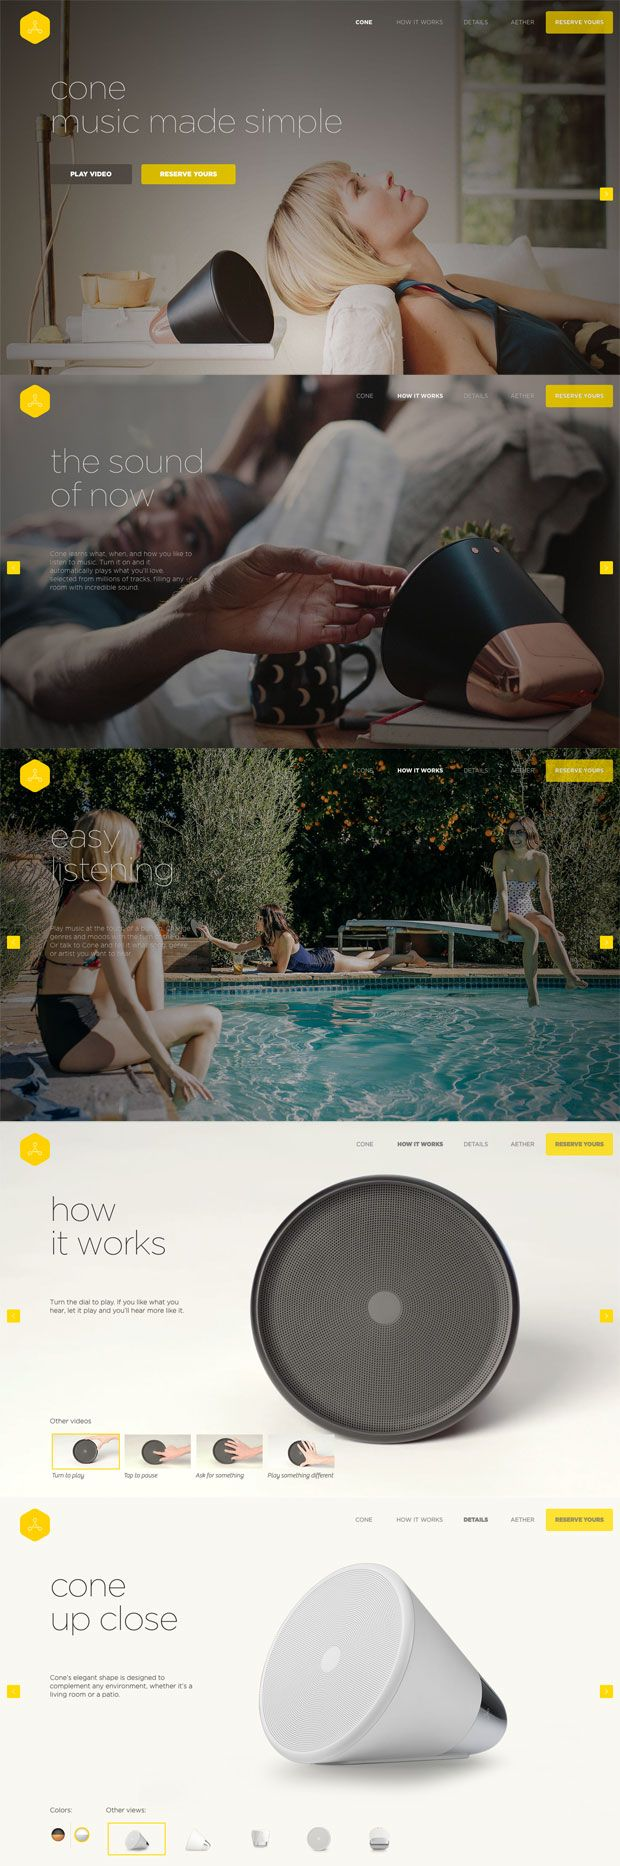 more image + less text + full creativity = worderfull webpage. #tecnodart #webdesign인터넷카지노 ∴ W888.CO.KR ∴ 현금카지노 인터넷카지노 ∴ W888.CO.KR ∴ 현금카지노 인터넷카지노 ∴ W888.CO.KR ∴ 현금카지노